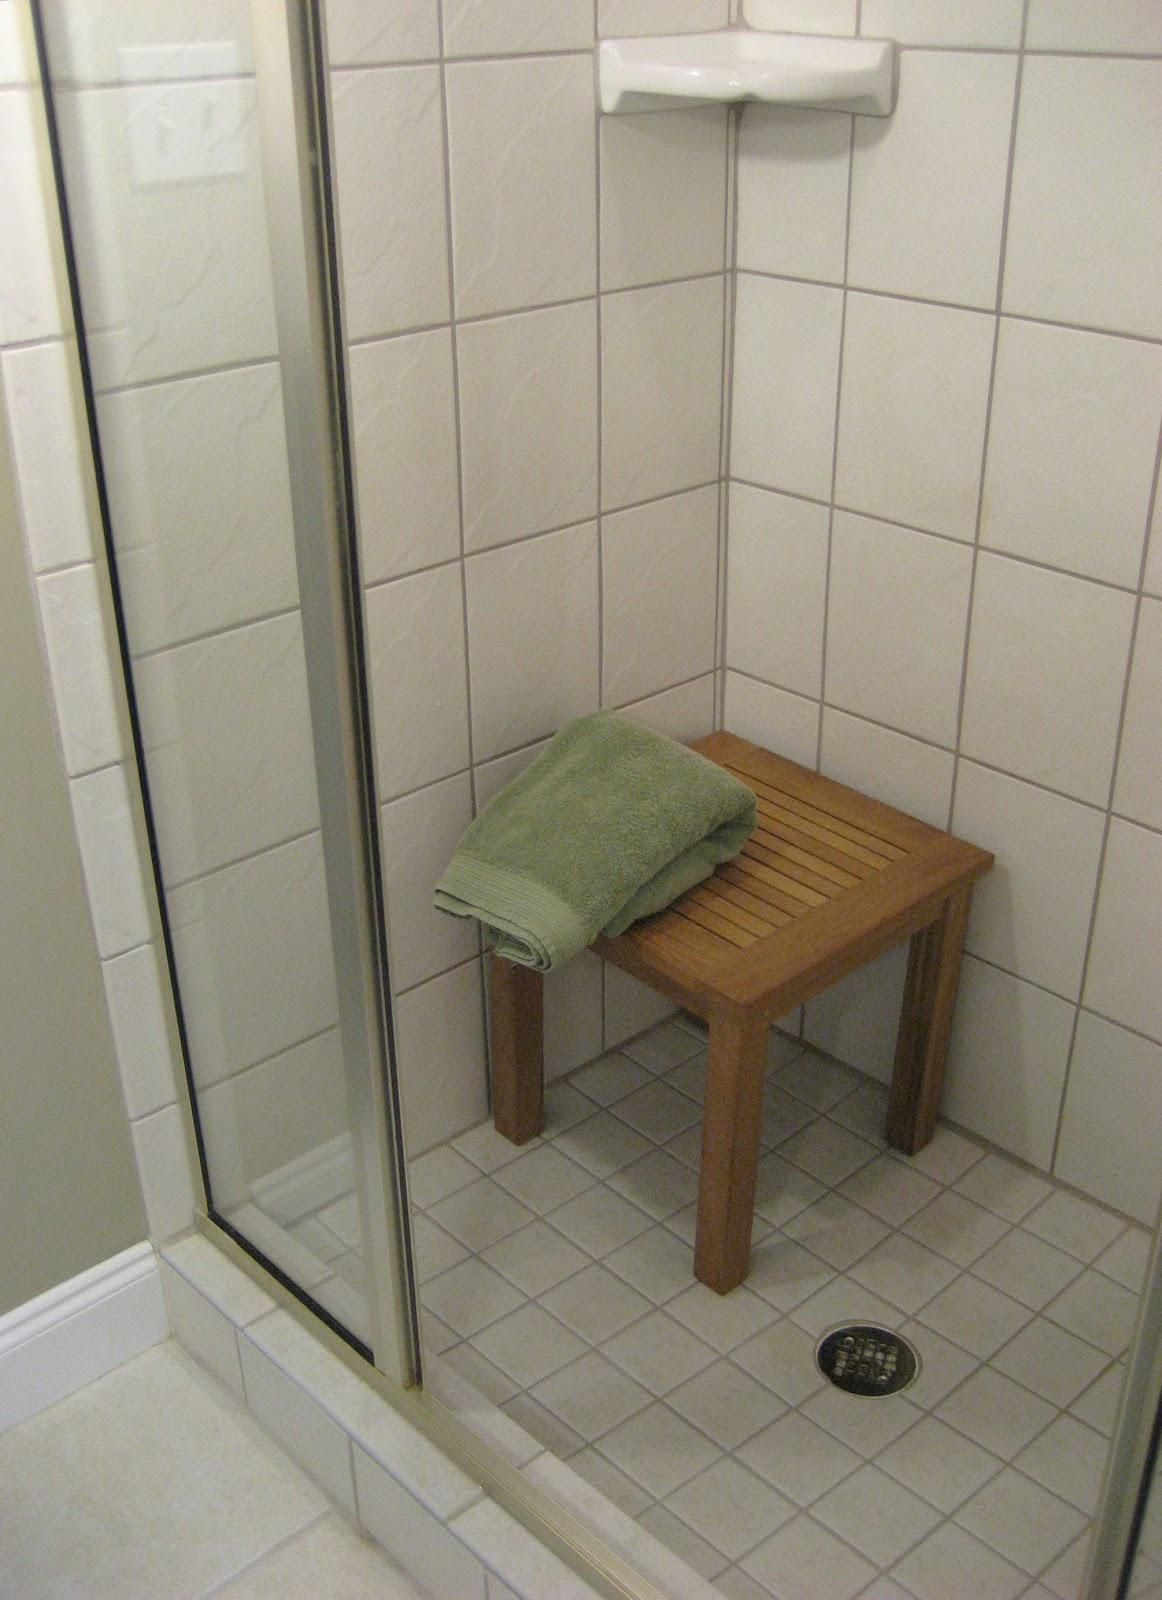 Home Improvements Teak Shower Seat